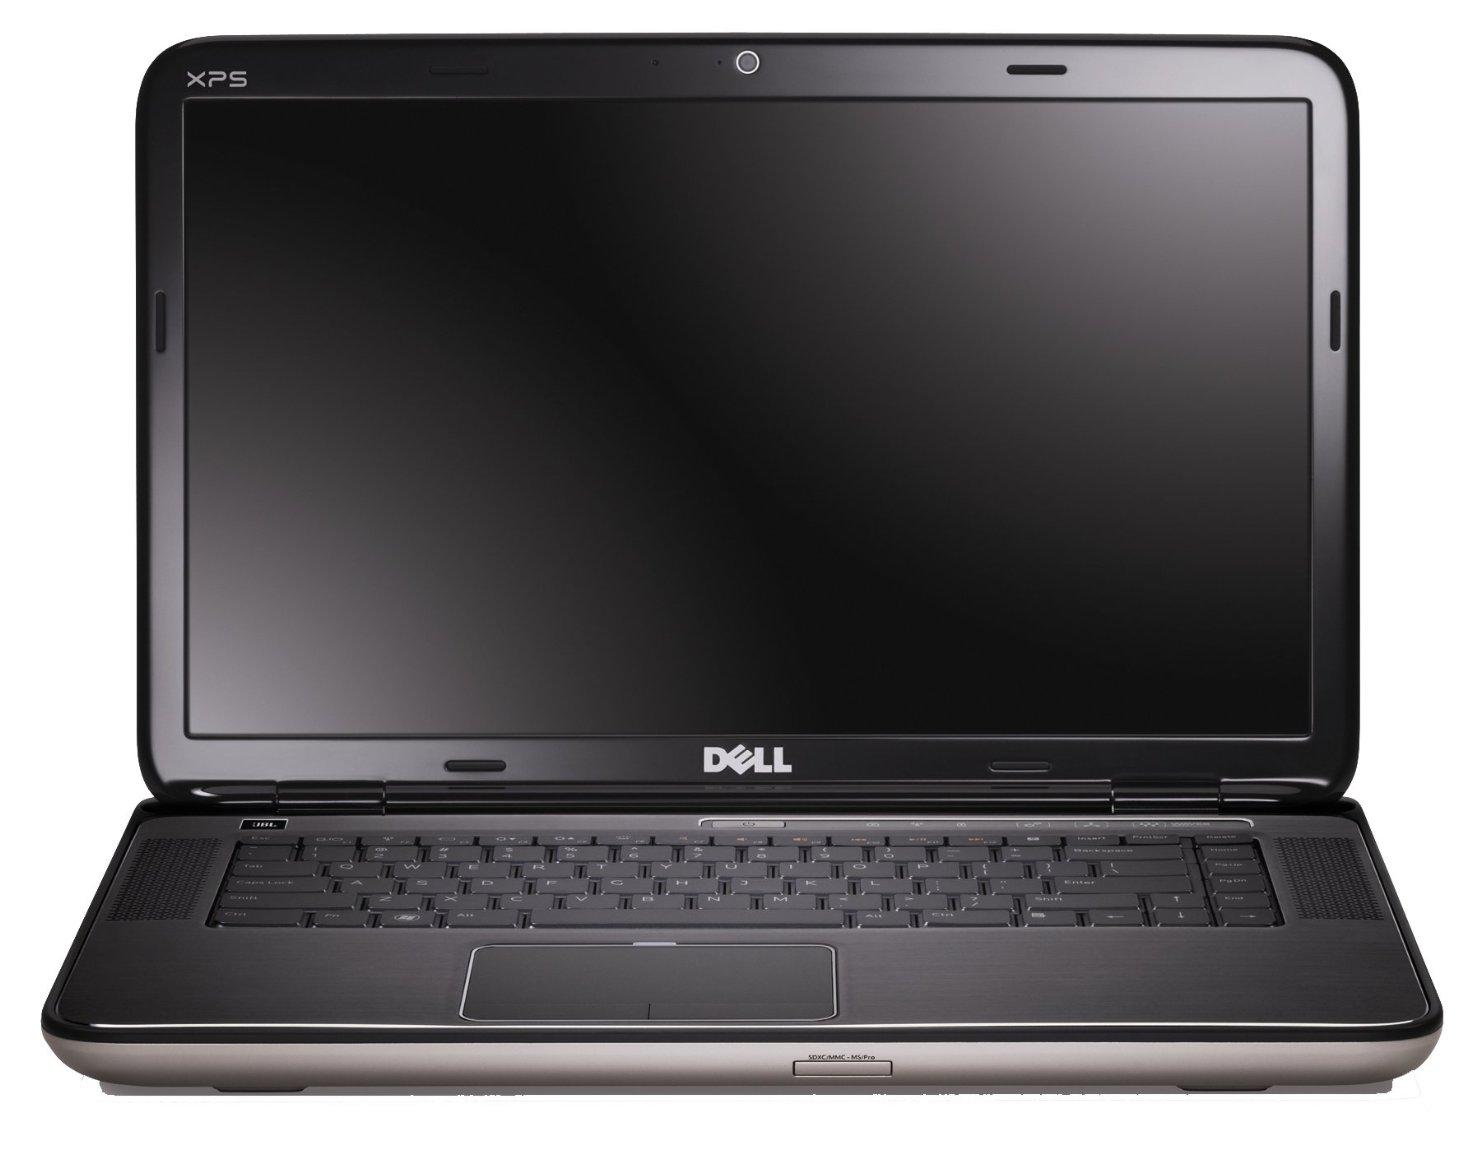 Купить Ноутбук Dell XPS 15 (7590-6671) фото 1